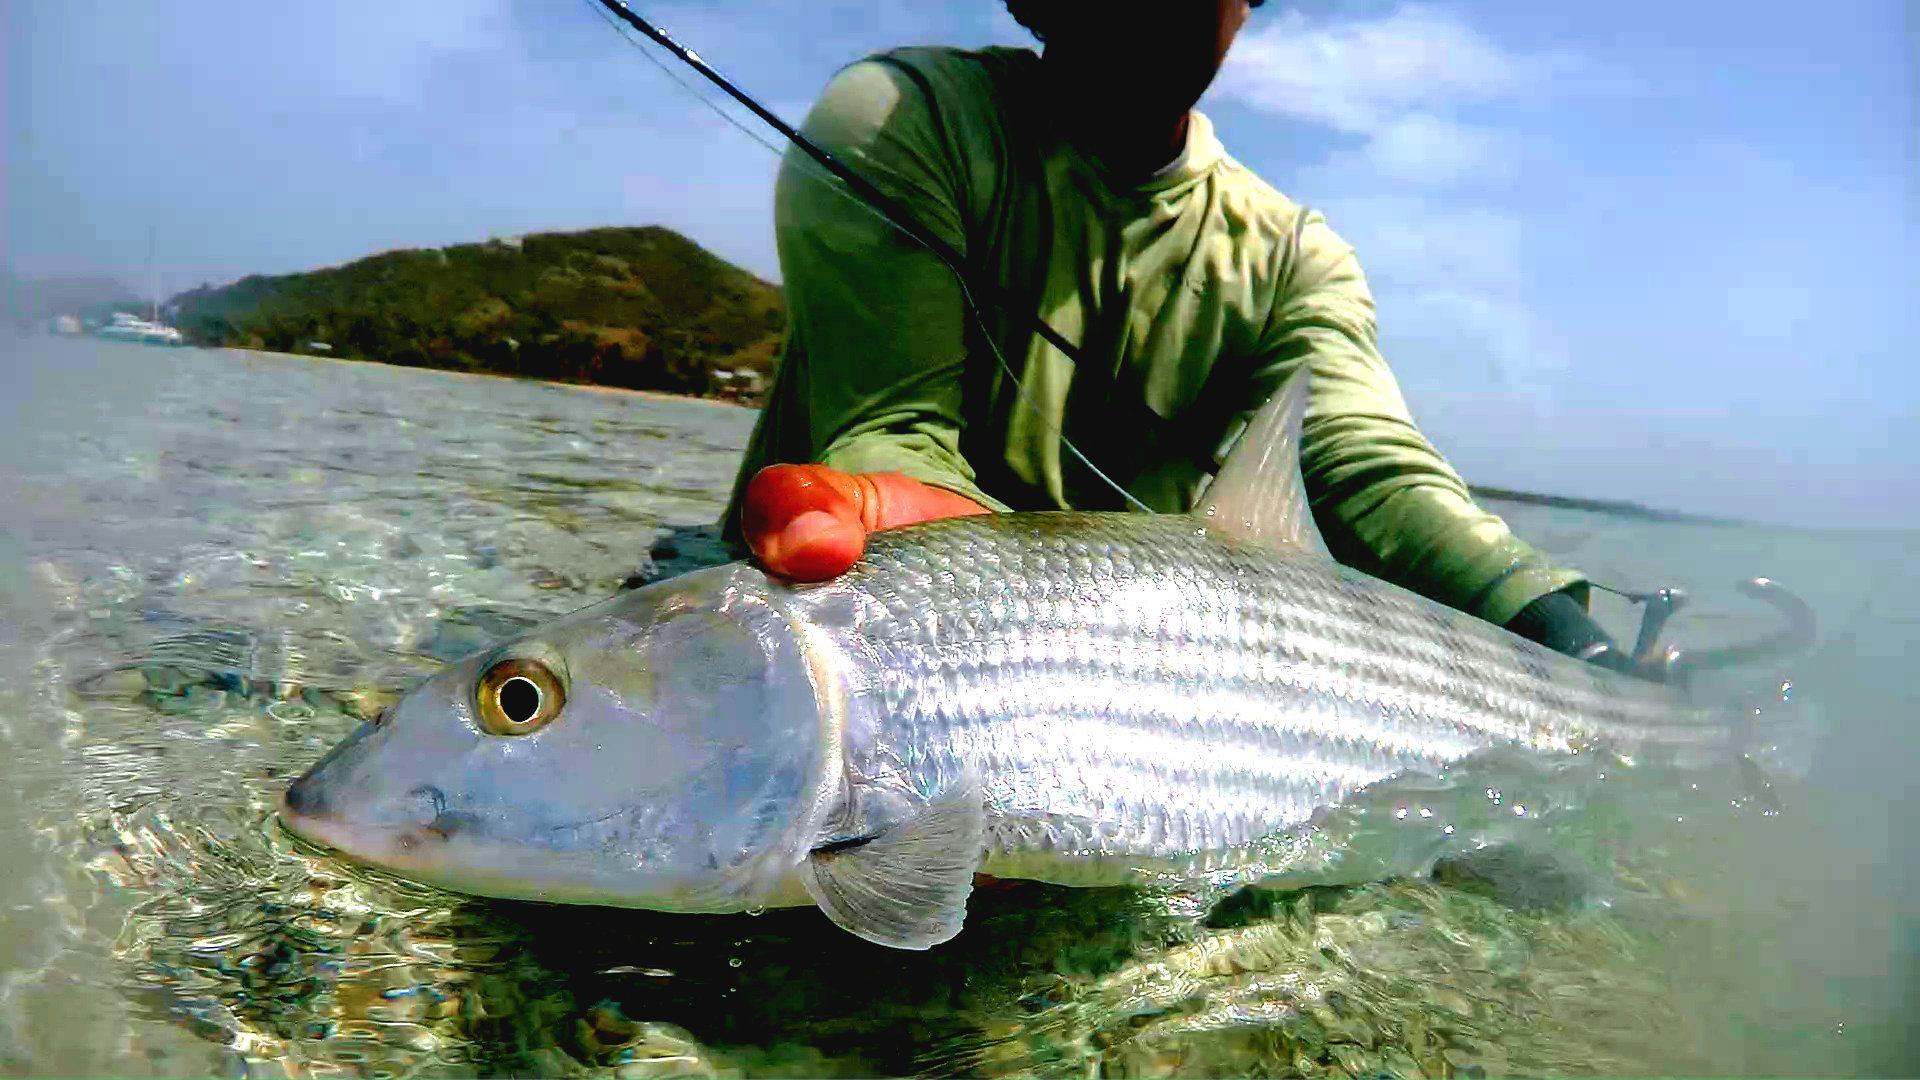 Nice Bonefish Catch In Our Secret Spots In The Grenadines Flyfishing Fishinginthegrenadines Bonefish Grenadine Fly Fishing Fishing Vacation Saltwater Flies